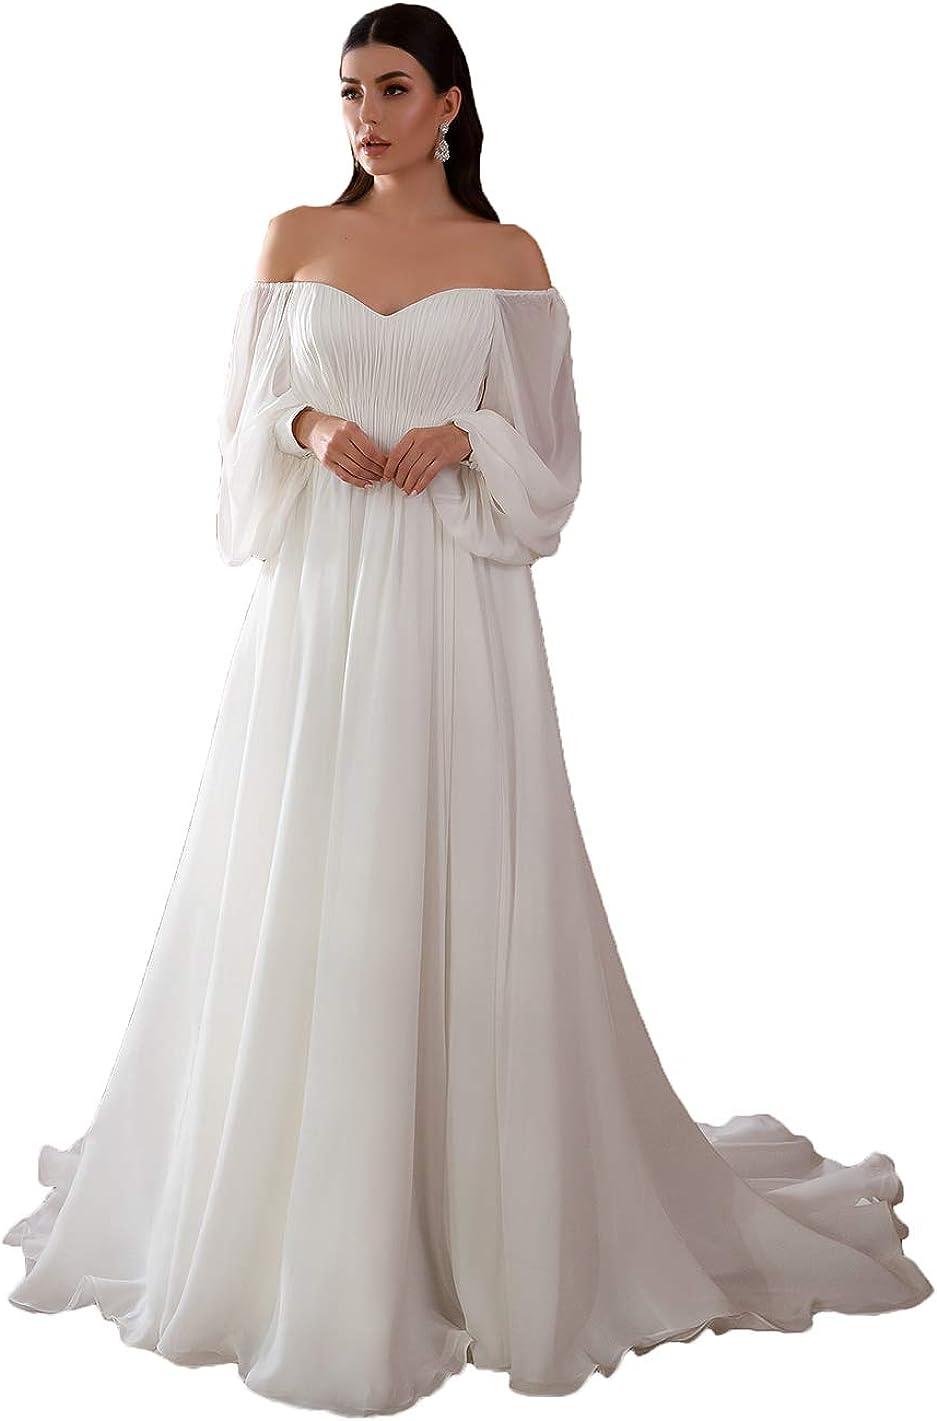 Awishwill Women's Long Puffy Sleeve Wedding Dresses Boho Chiffon Beach Bridal Gowns 2021